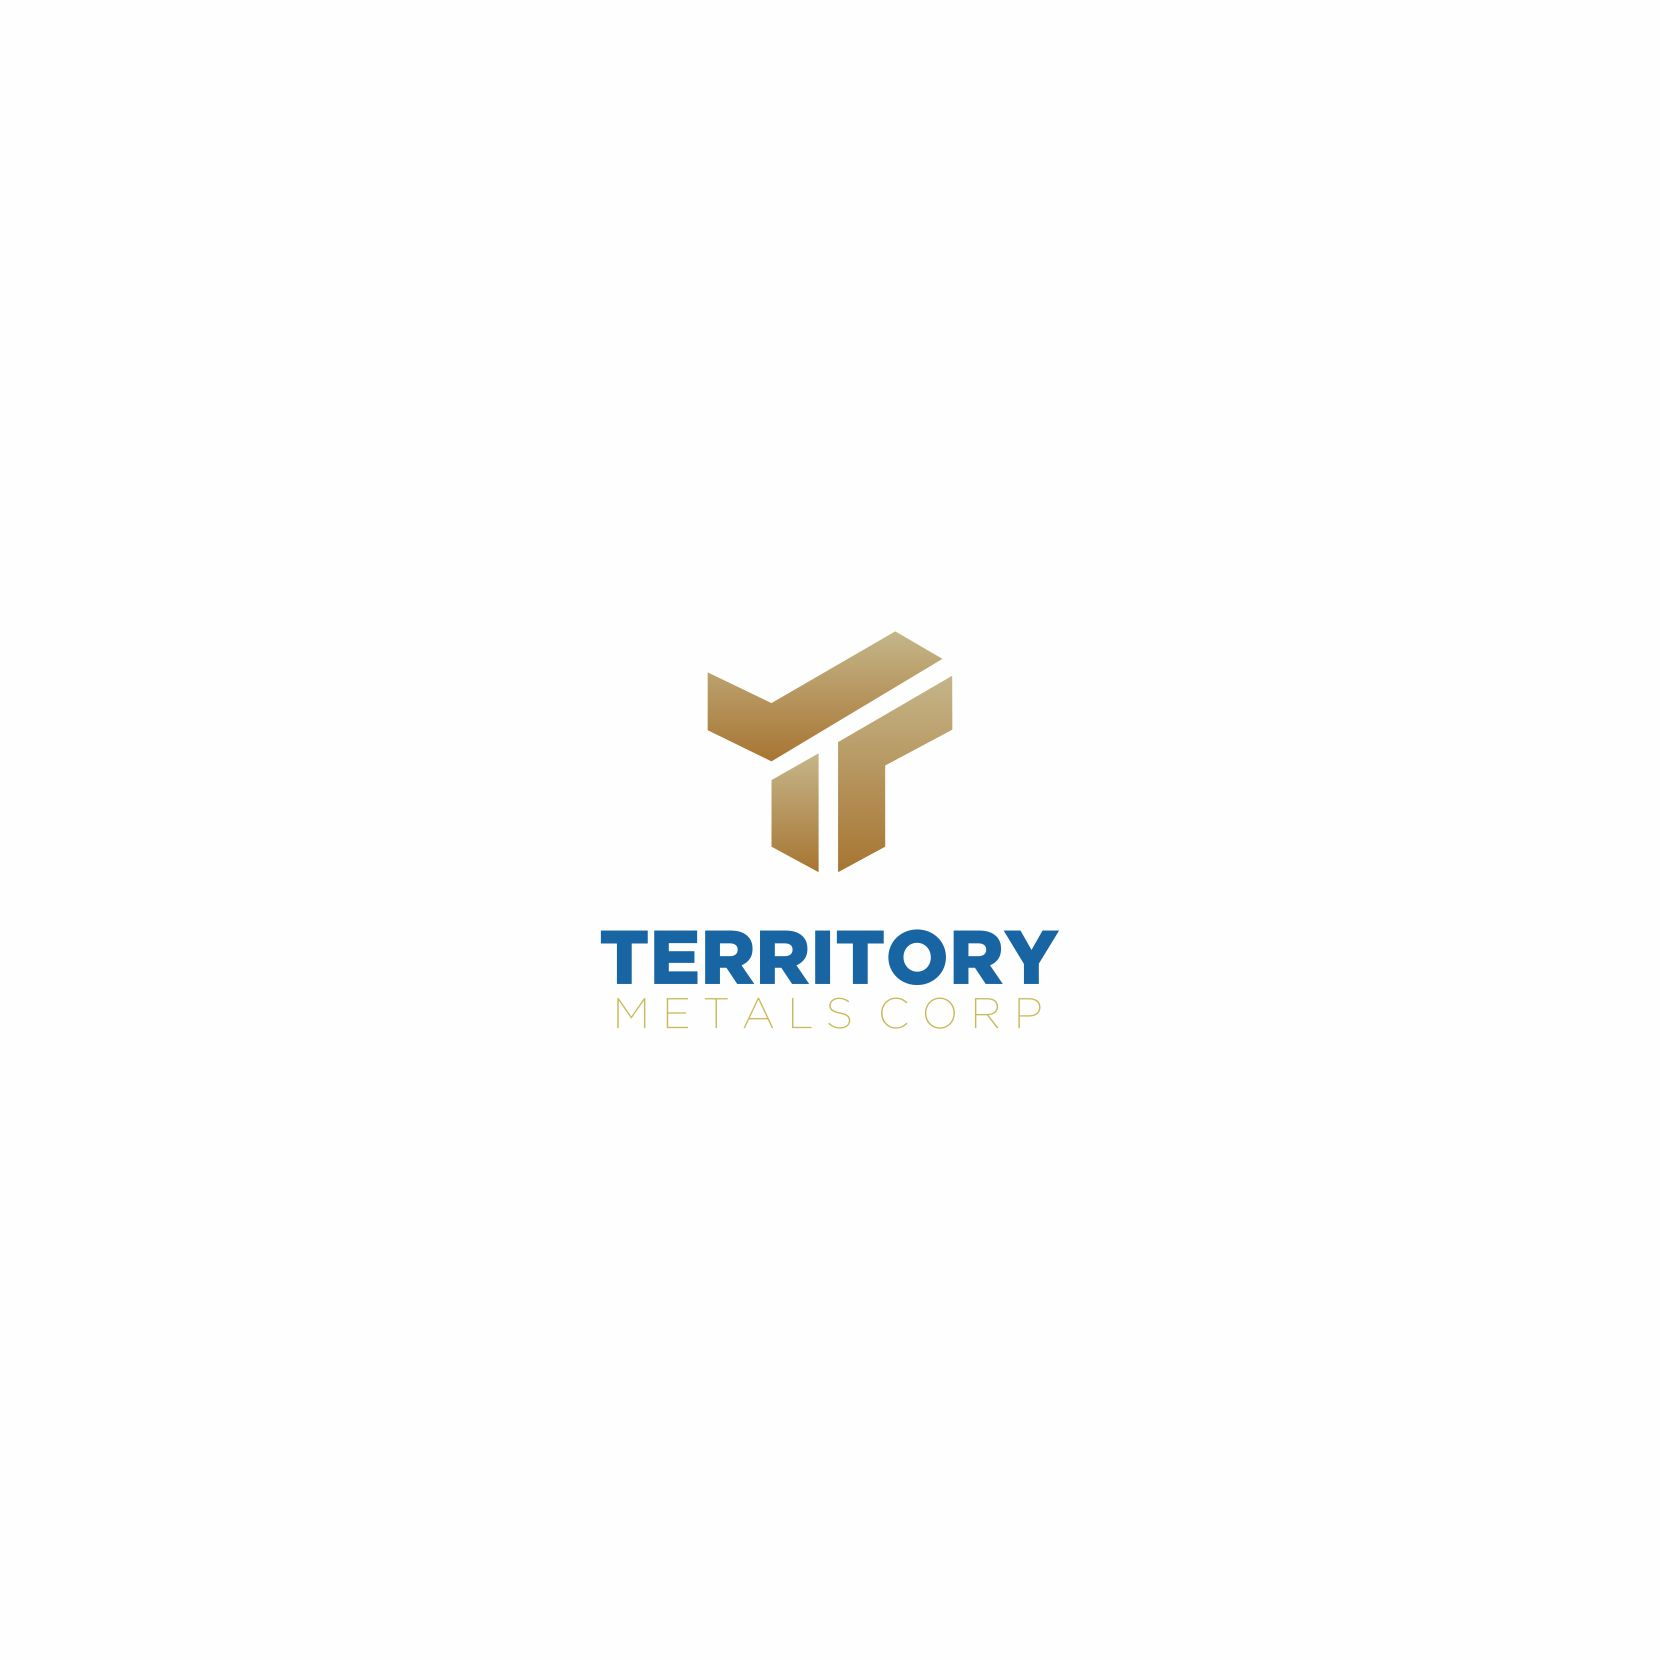 Logo Design by Balya ibnu Bi malkan - Entry No. 231 in the Logo Design Contest Unique Logo Design Wanted for Territory Metals Corp..